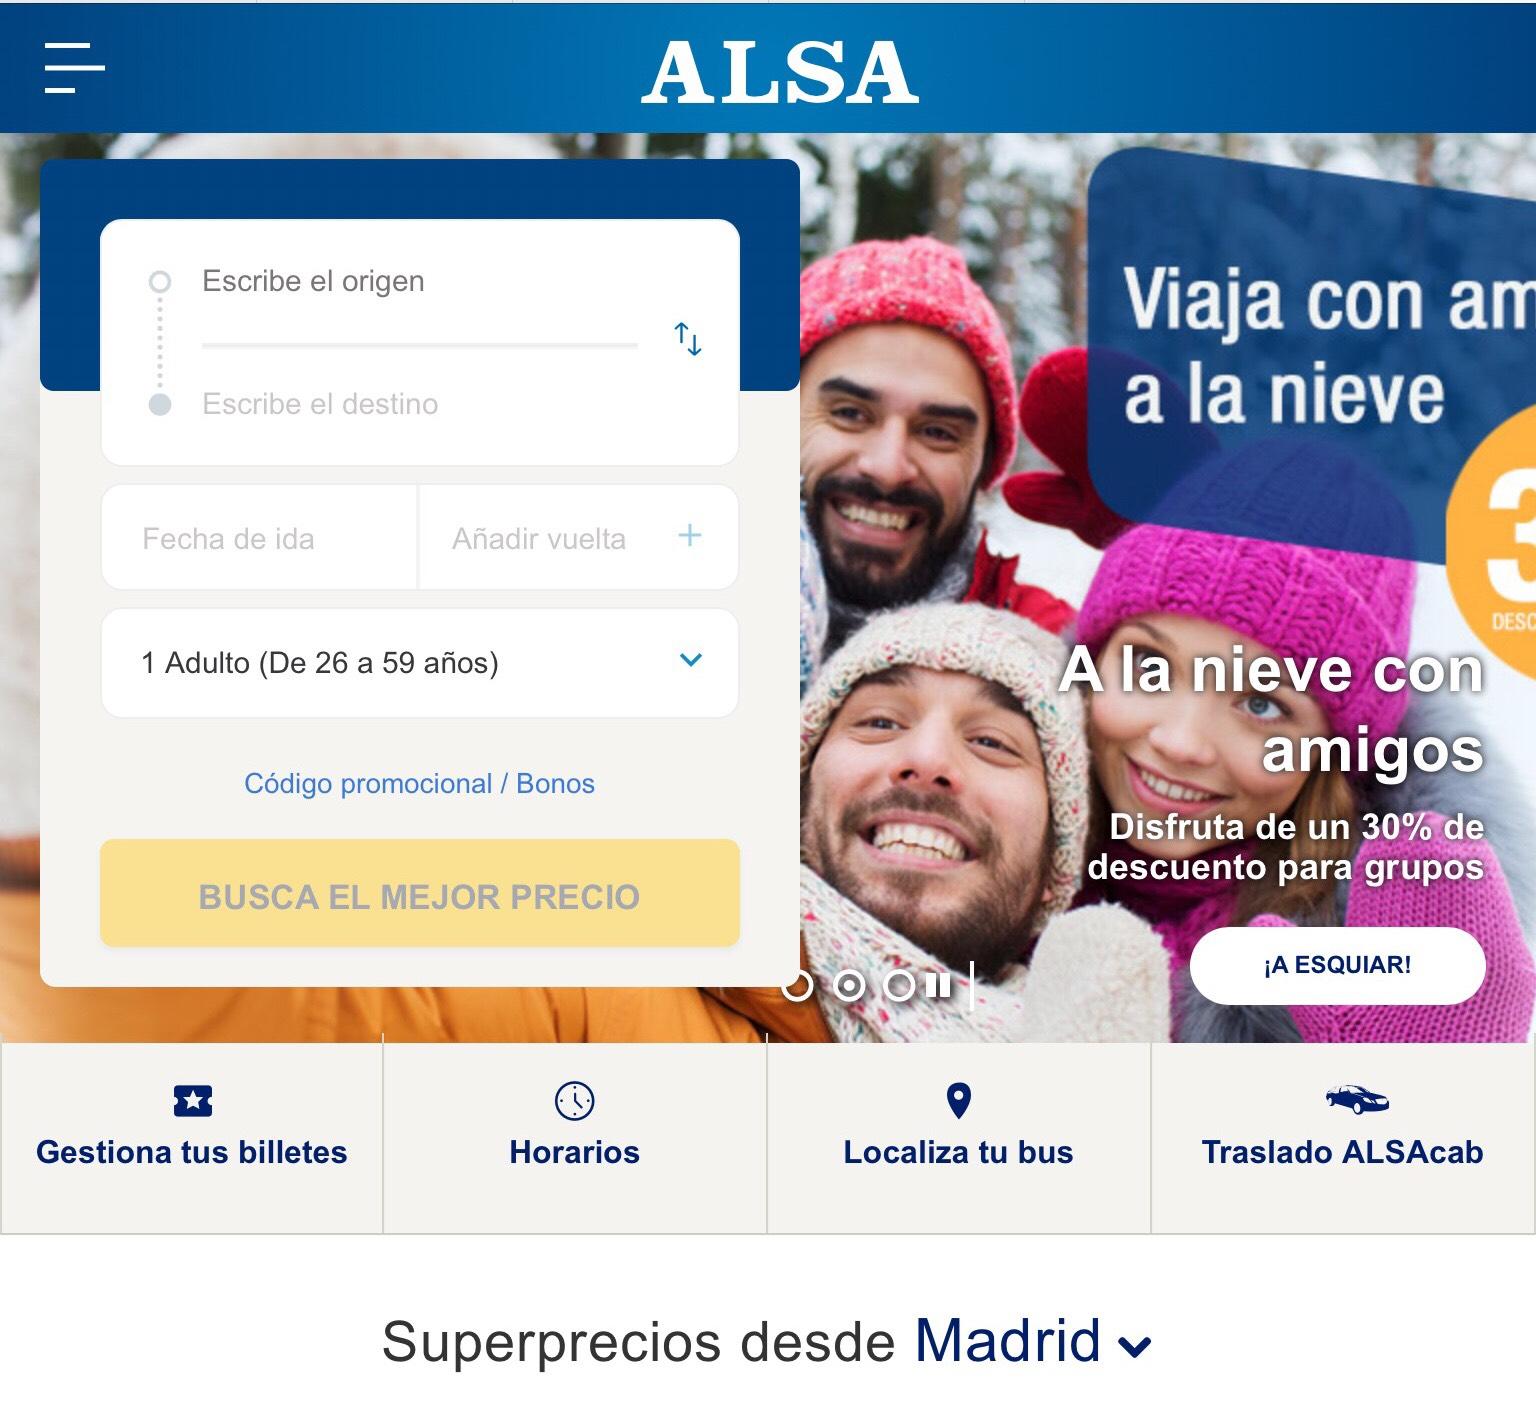 Dsd 5€ – Bus a Madrid dsd 7 ciudades en mayo, hasta -85% Alsa